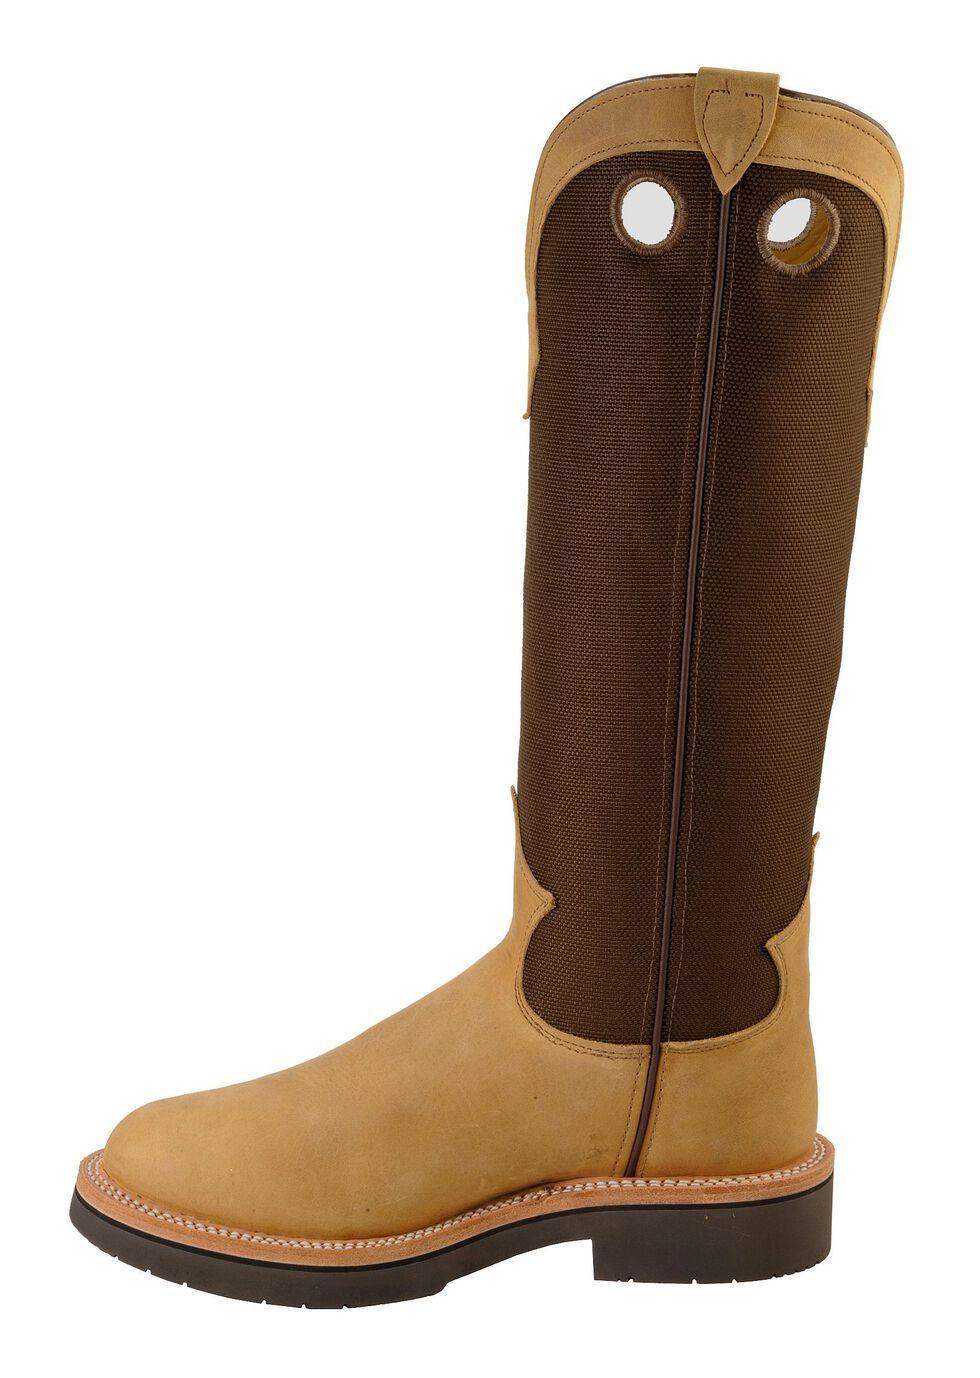 "Justin Men's 17"" Tuff Snake Boots - Round Toe, Dune, hi-res"